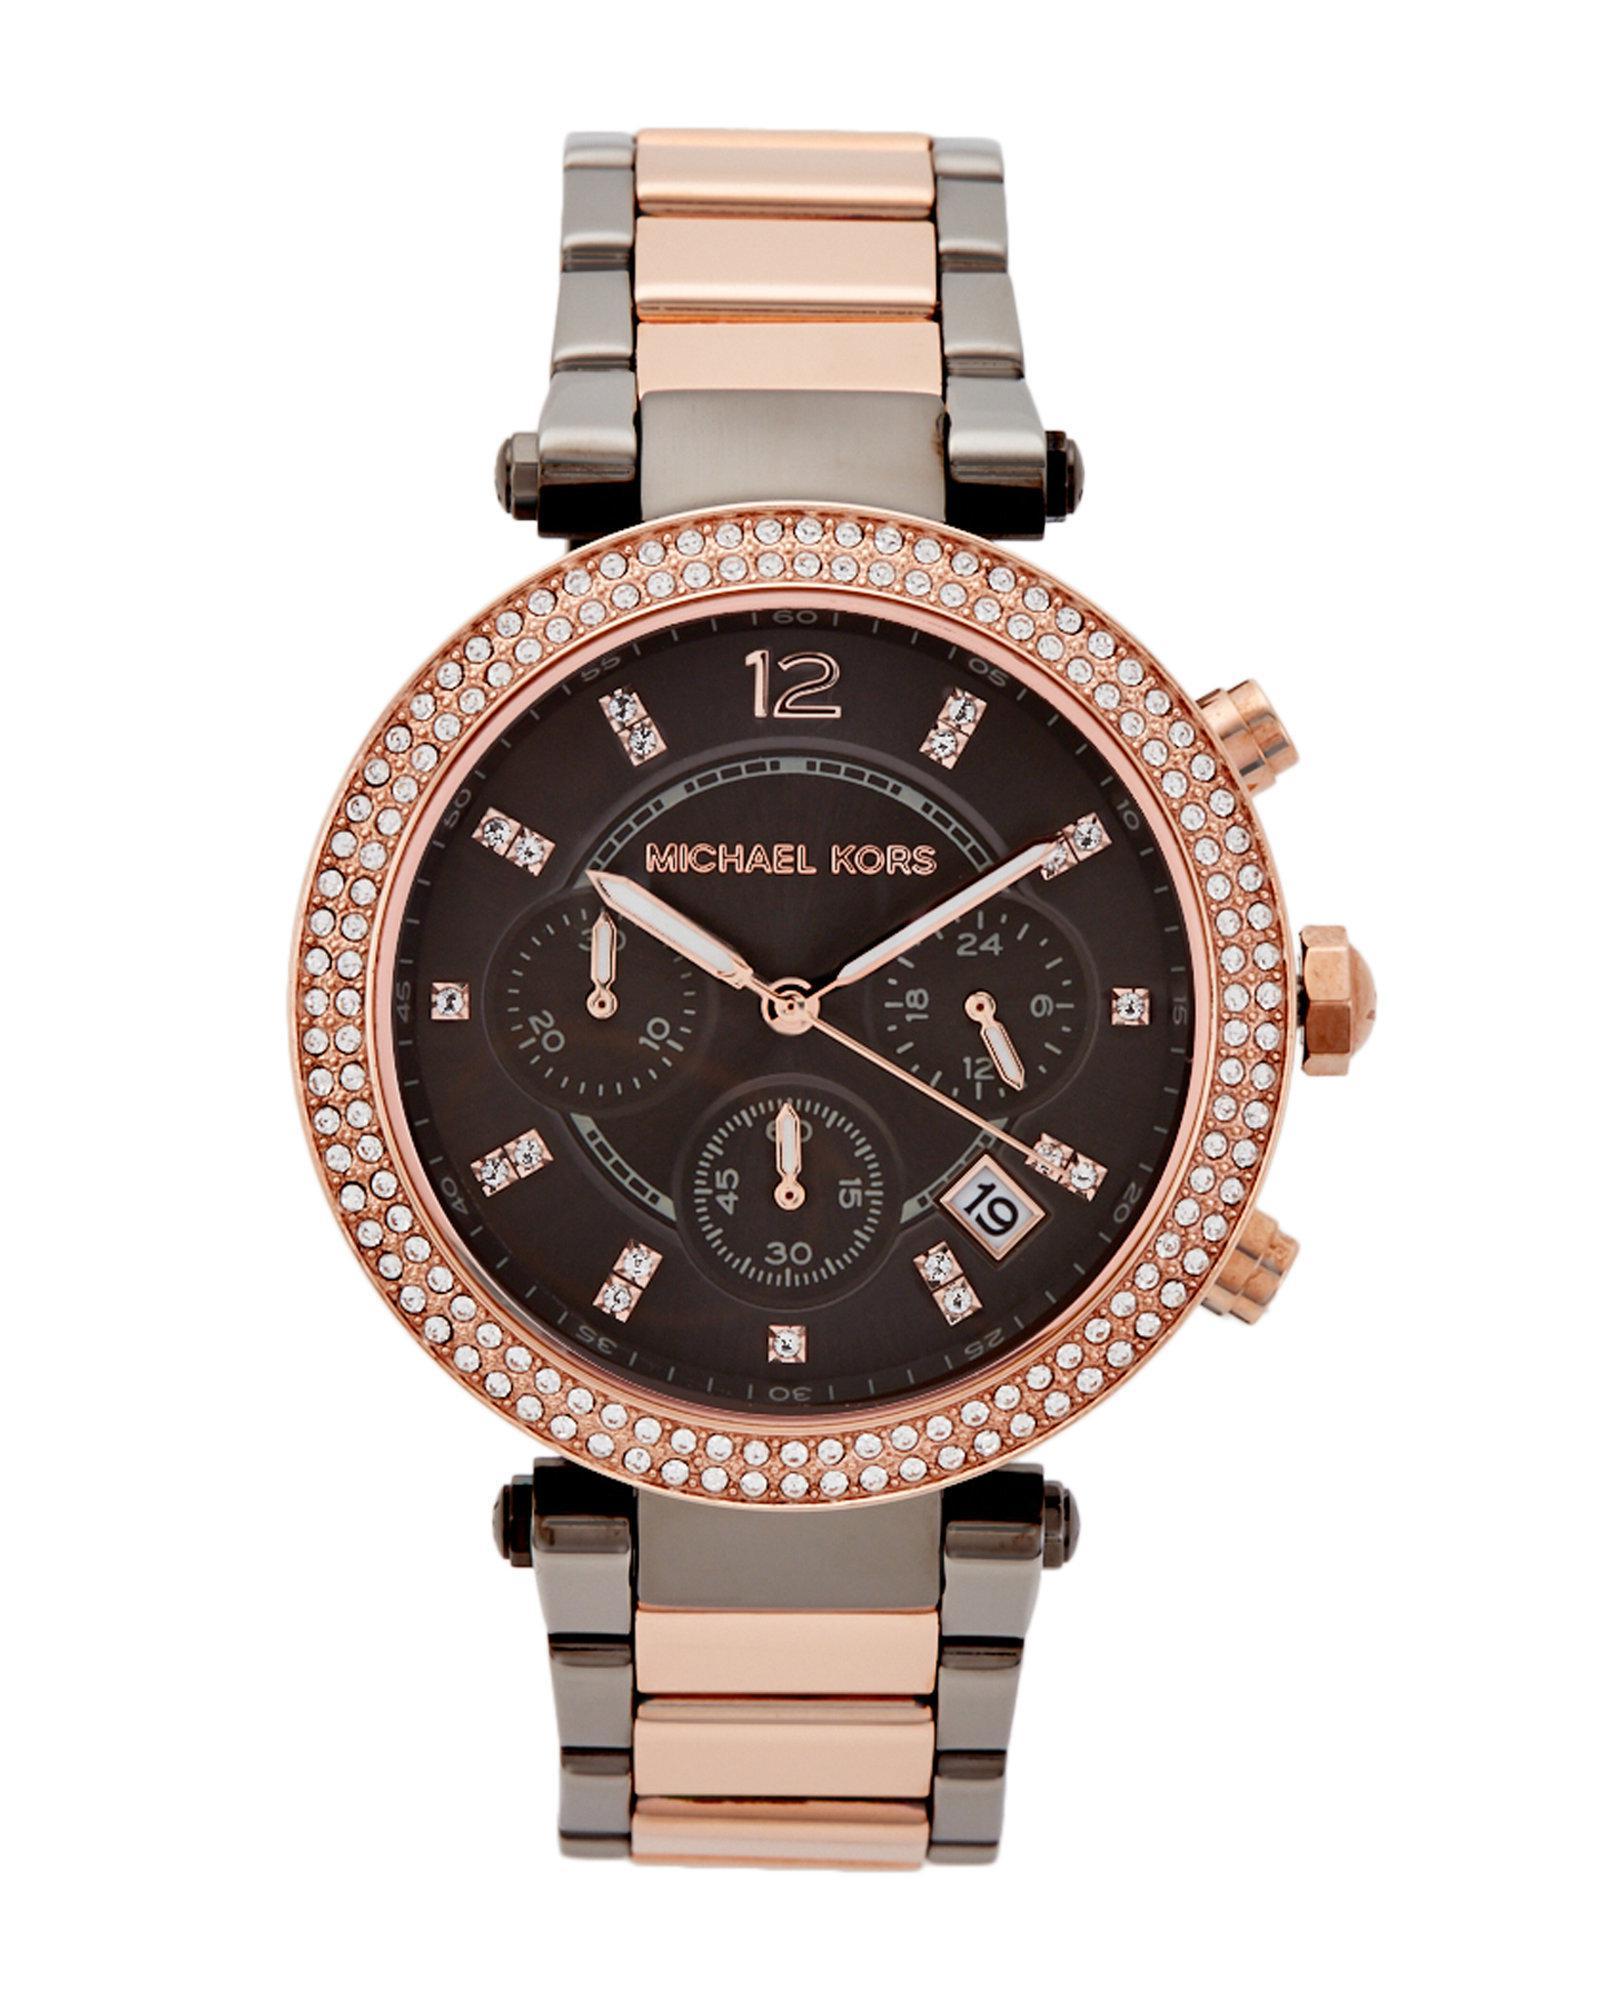 db8b41c657a9 Lyst - Michael Kors Mk6440 Two-tone Parker Watch